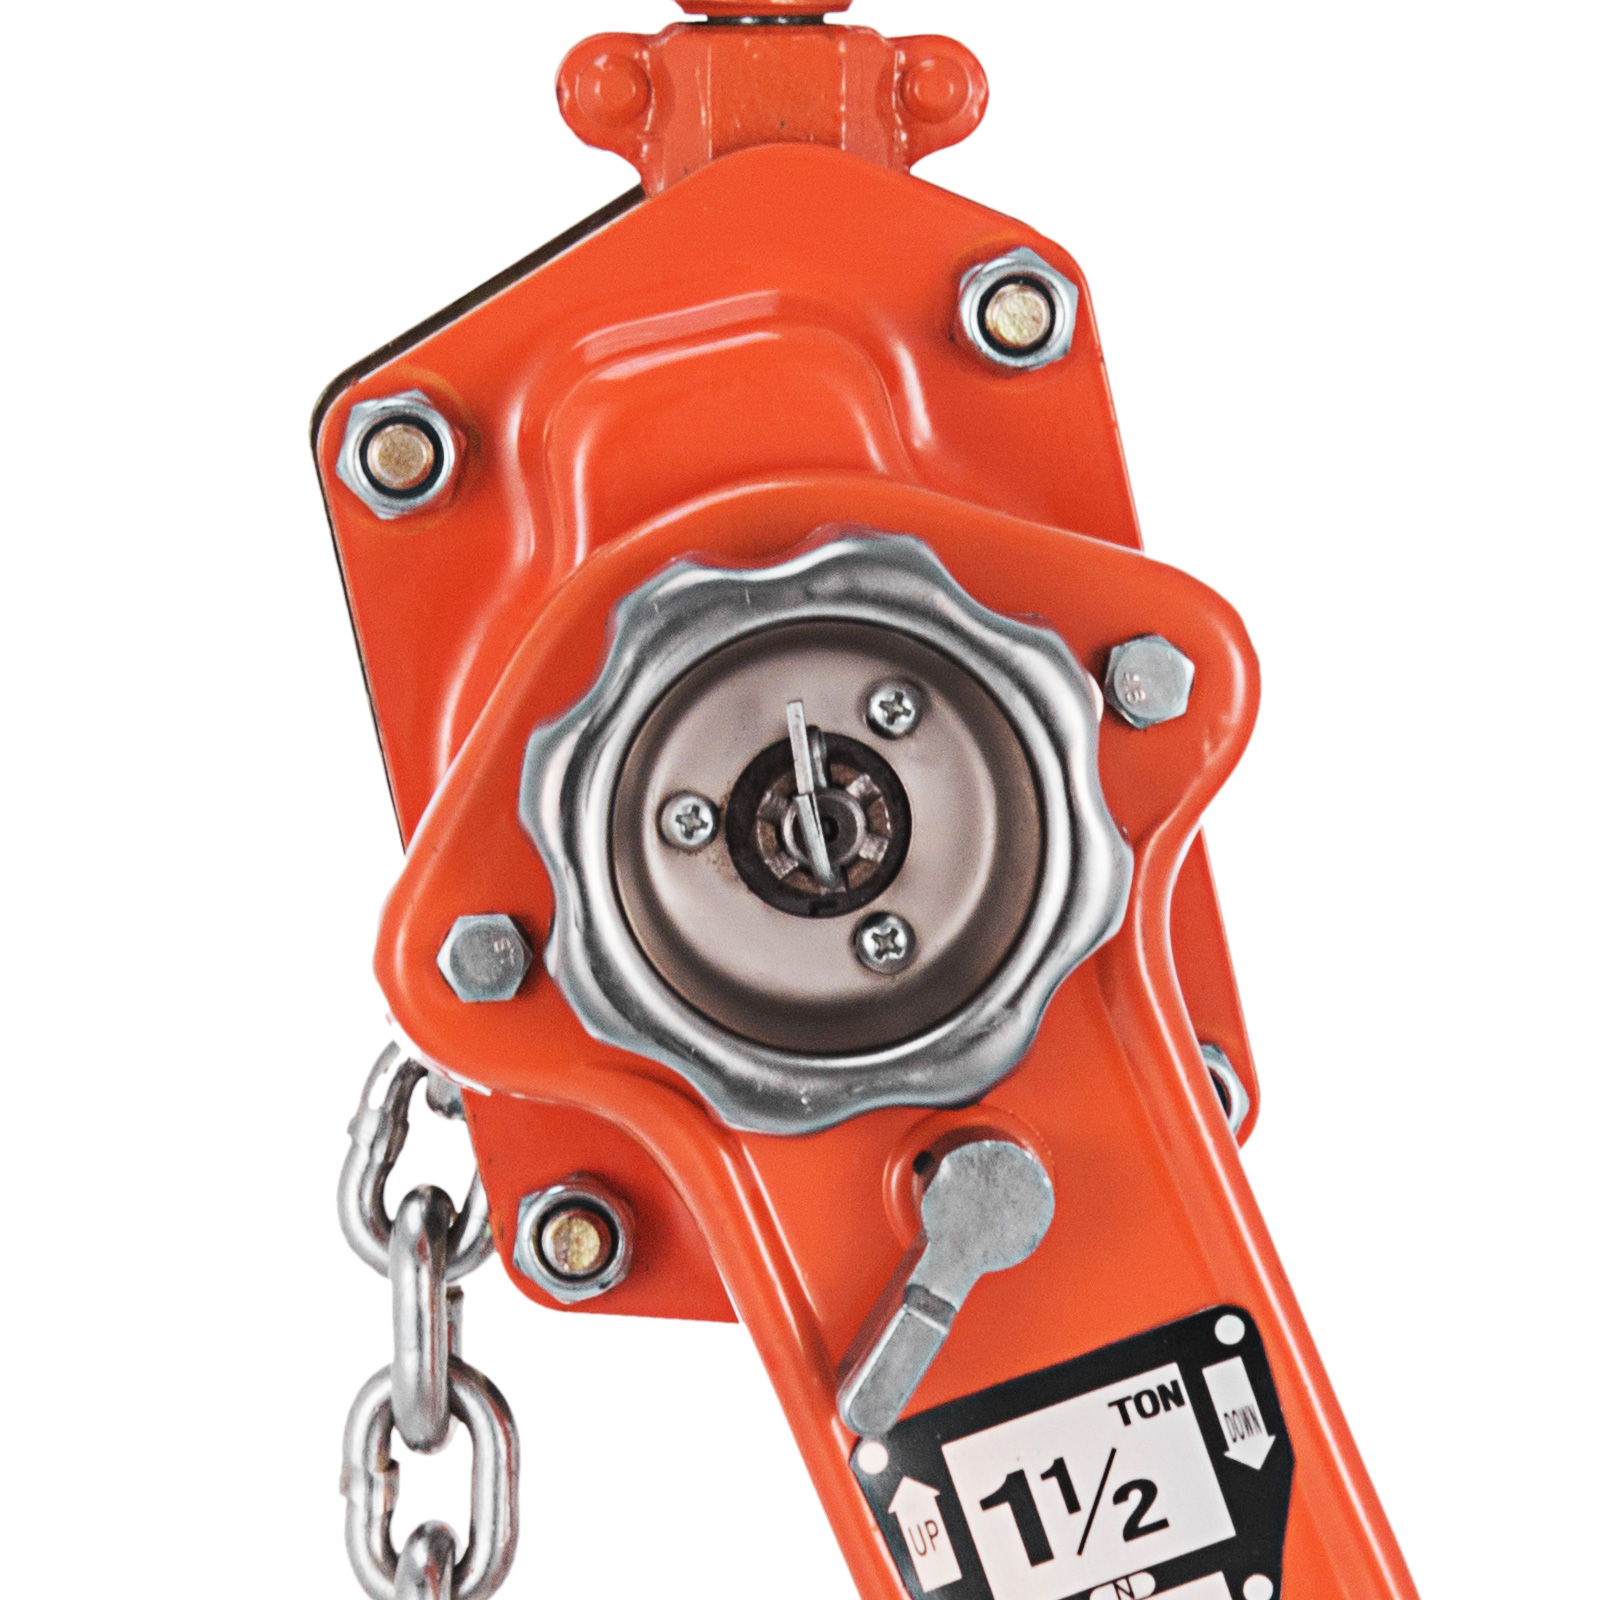 1-5T-Lever-Block-Chain-Hoist-1-5M-6M-Lift-Pull-Machinery-Gear-FACTORY-DISCOUNT thumbnail 42